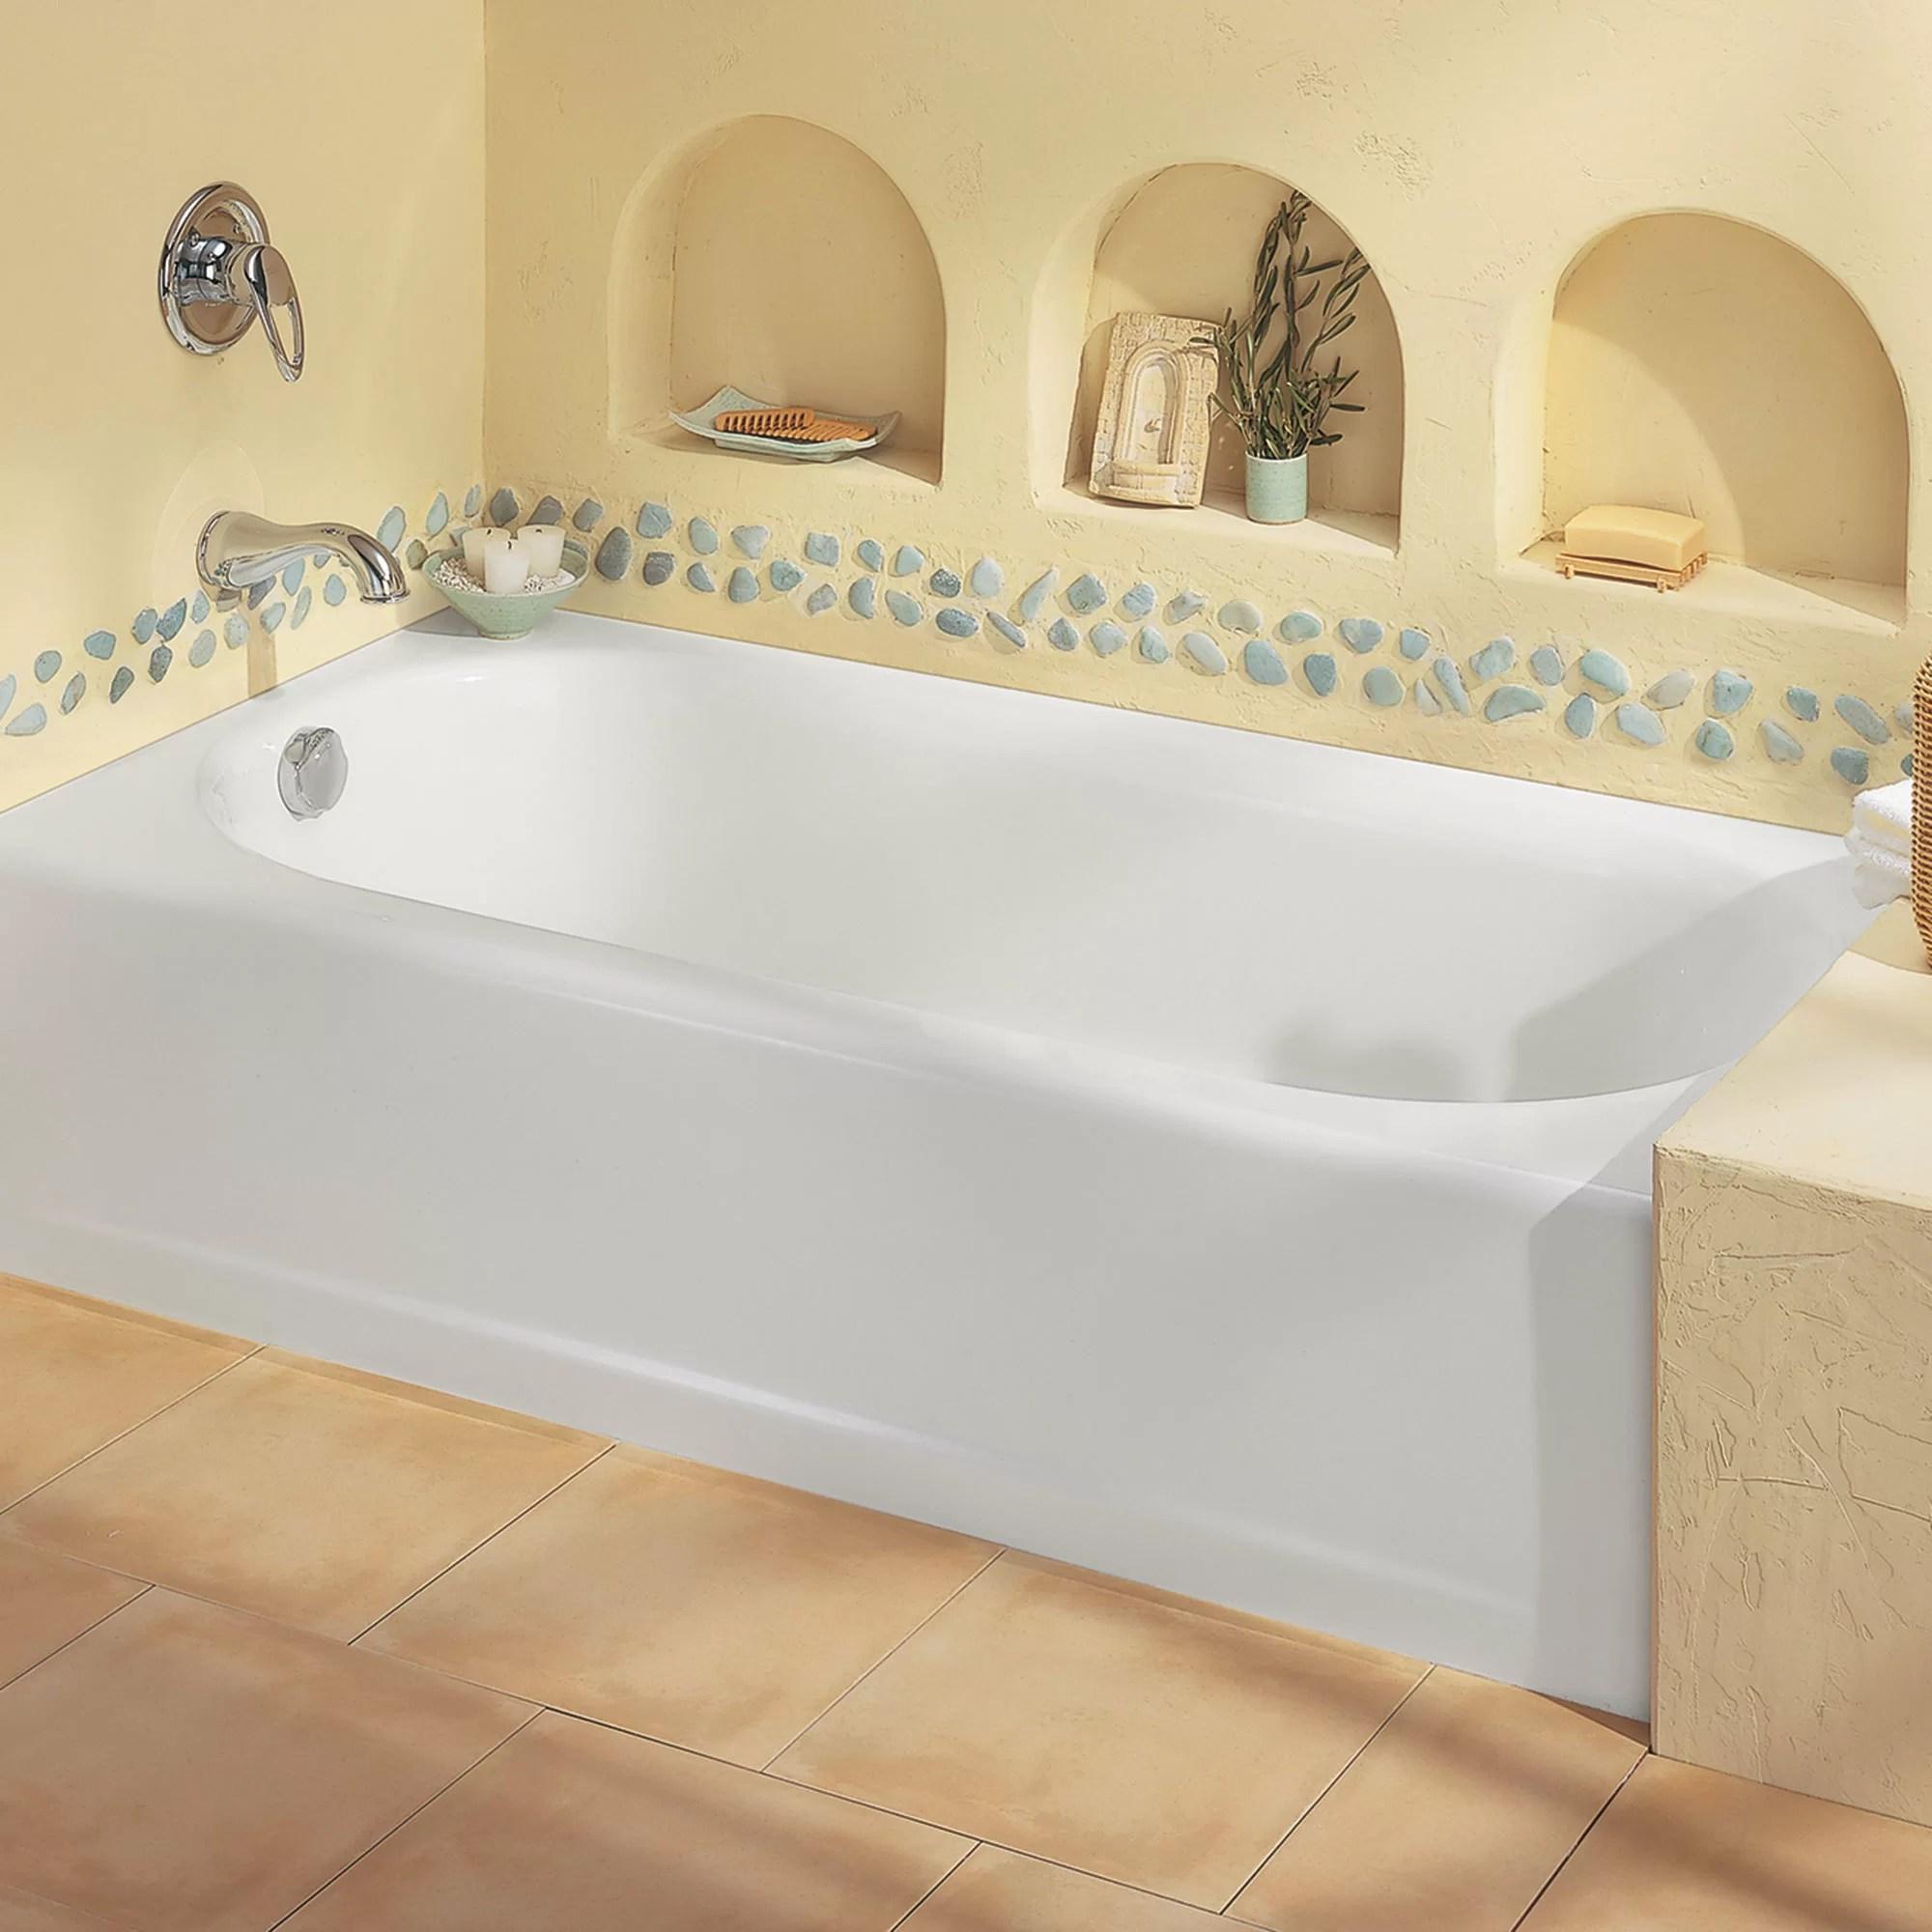 American Standard Princeton 60 X 30 Alcove Soaking Bathtub Reviews